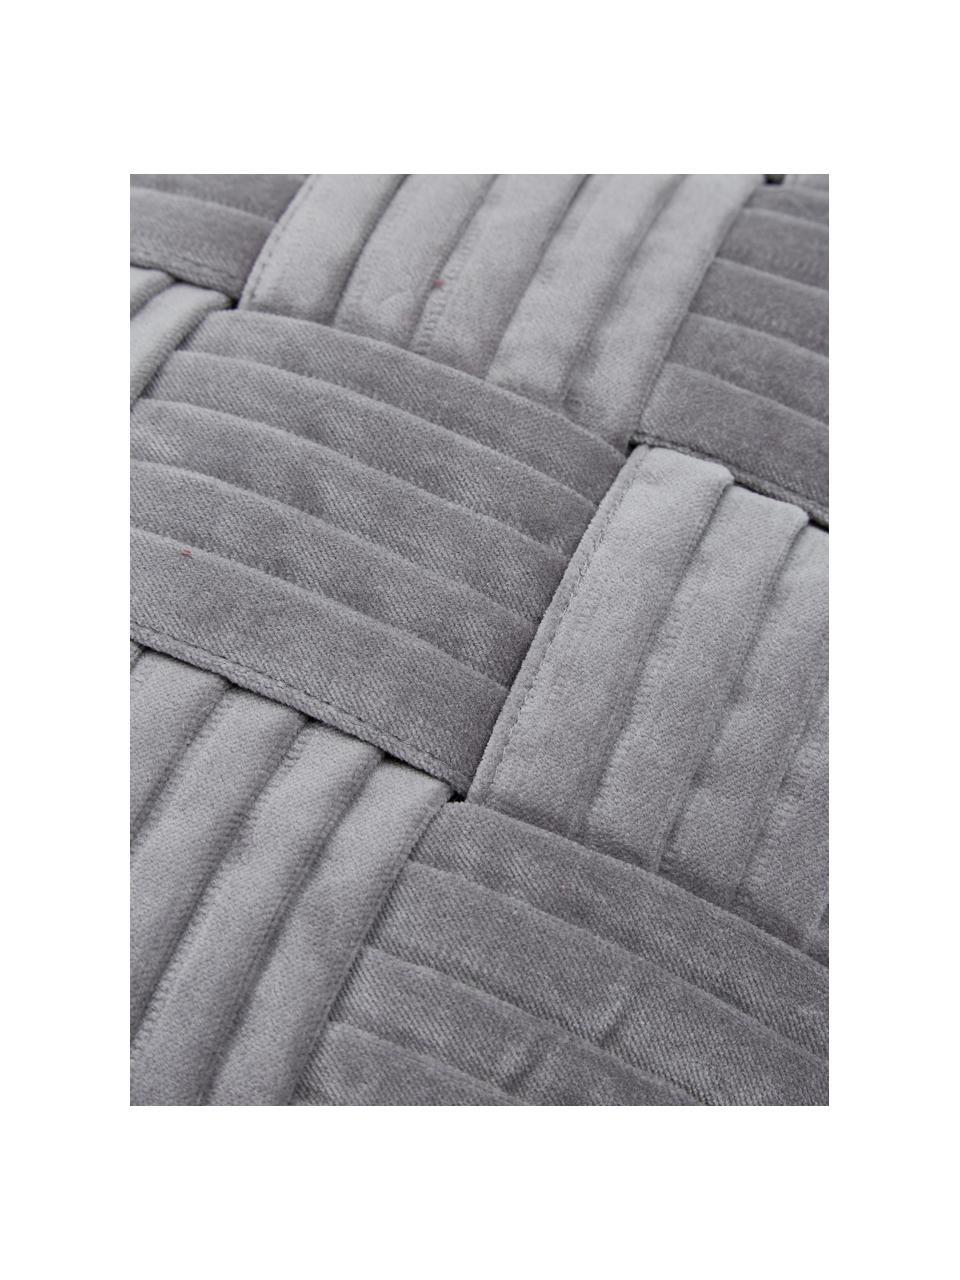 Samt-Kissenhülle Sina in Dunkelgrau mit Strukturmuster, Samt (100% Baumwolle), Grau, 45 x 45 cm